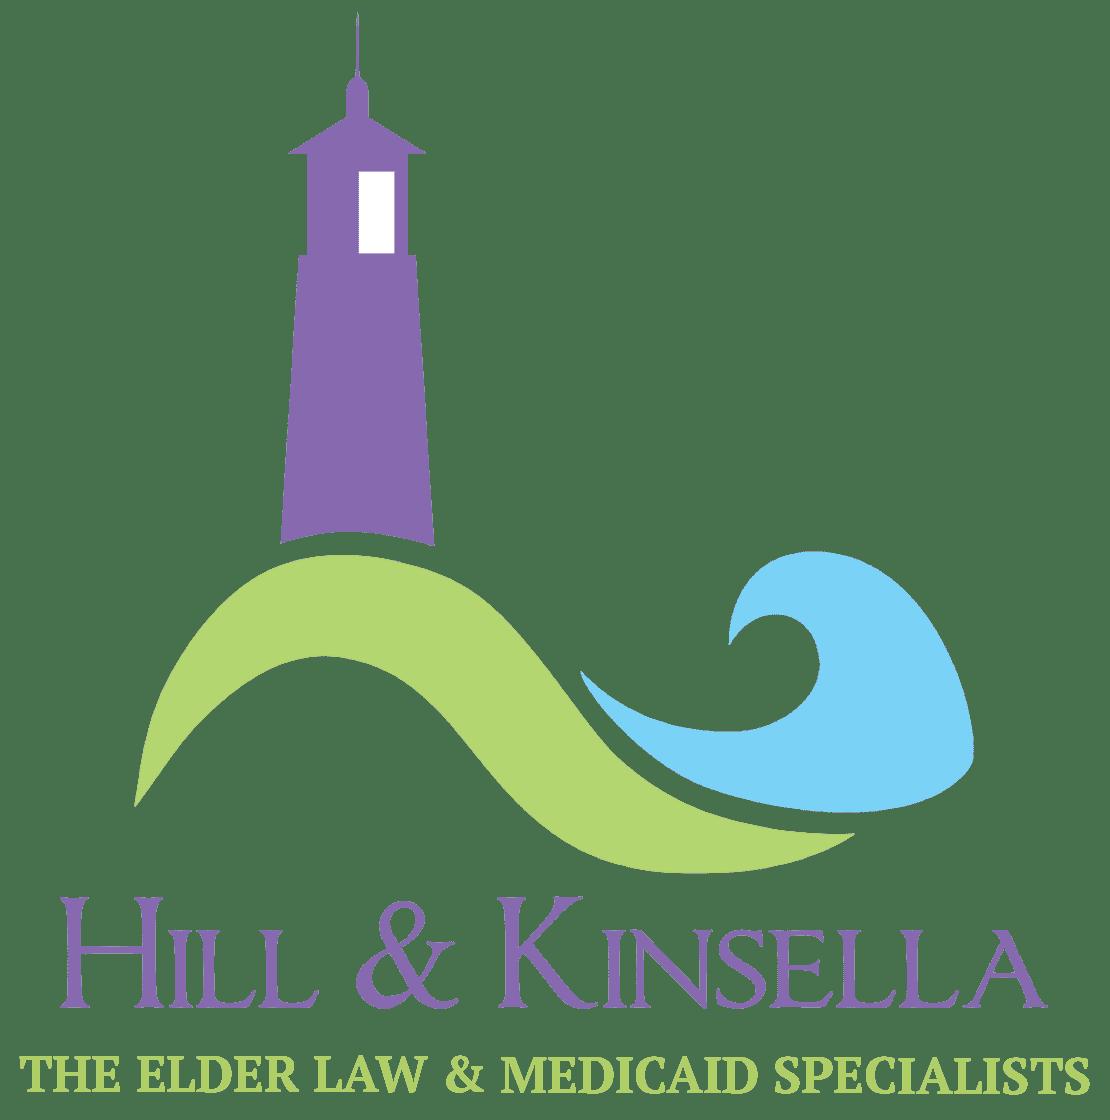 Hill & Kinsella Law Group